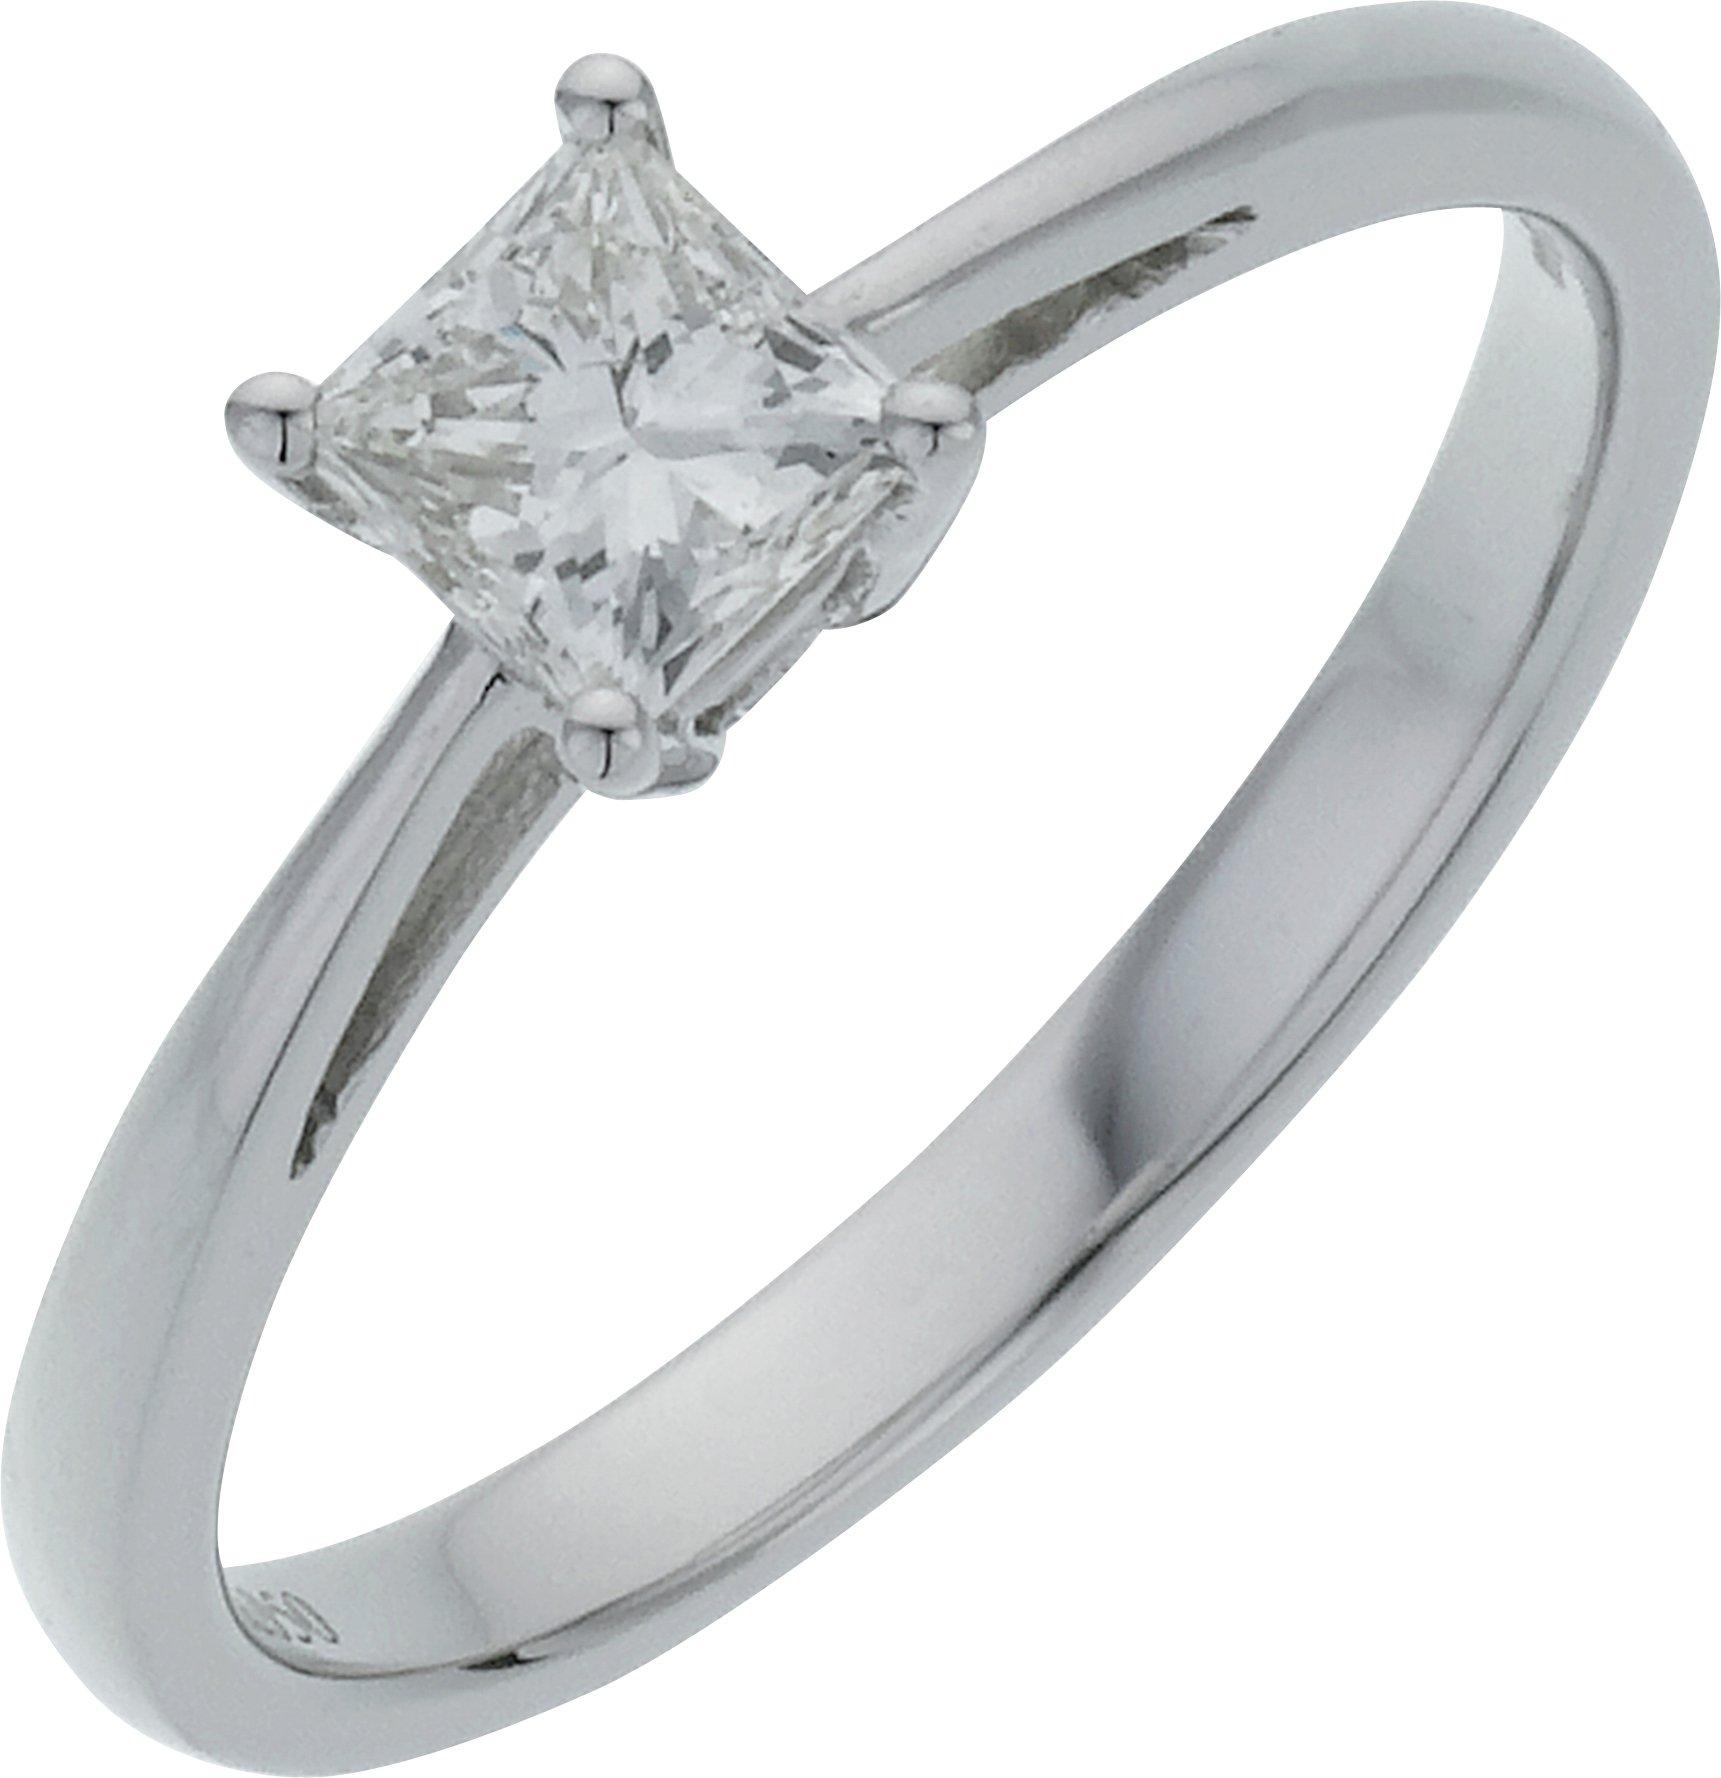 18 Carat White Gold 05 Carat Diamond - Princess Cut Diamond - Ring - N